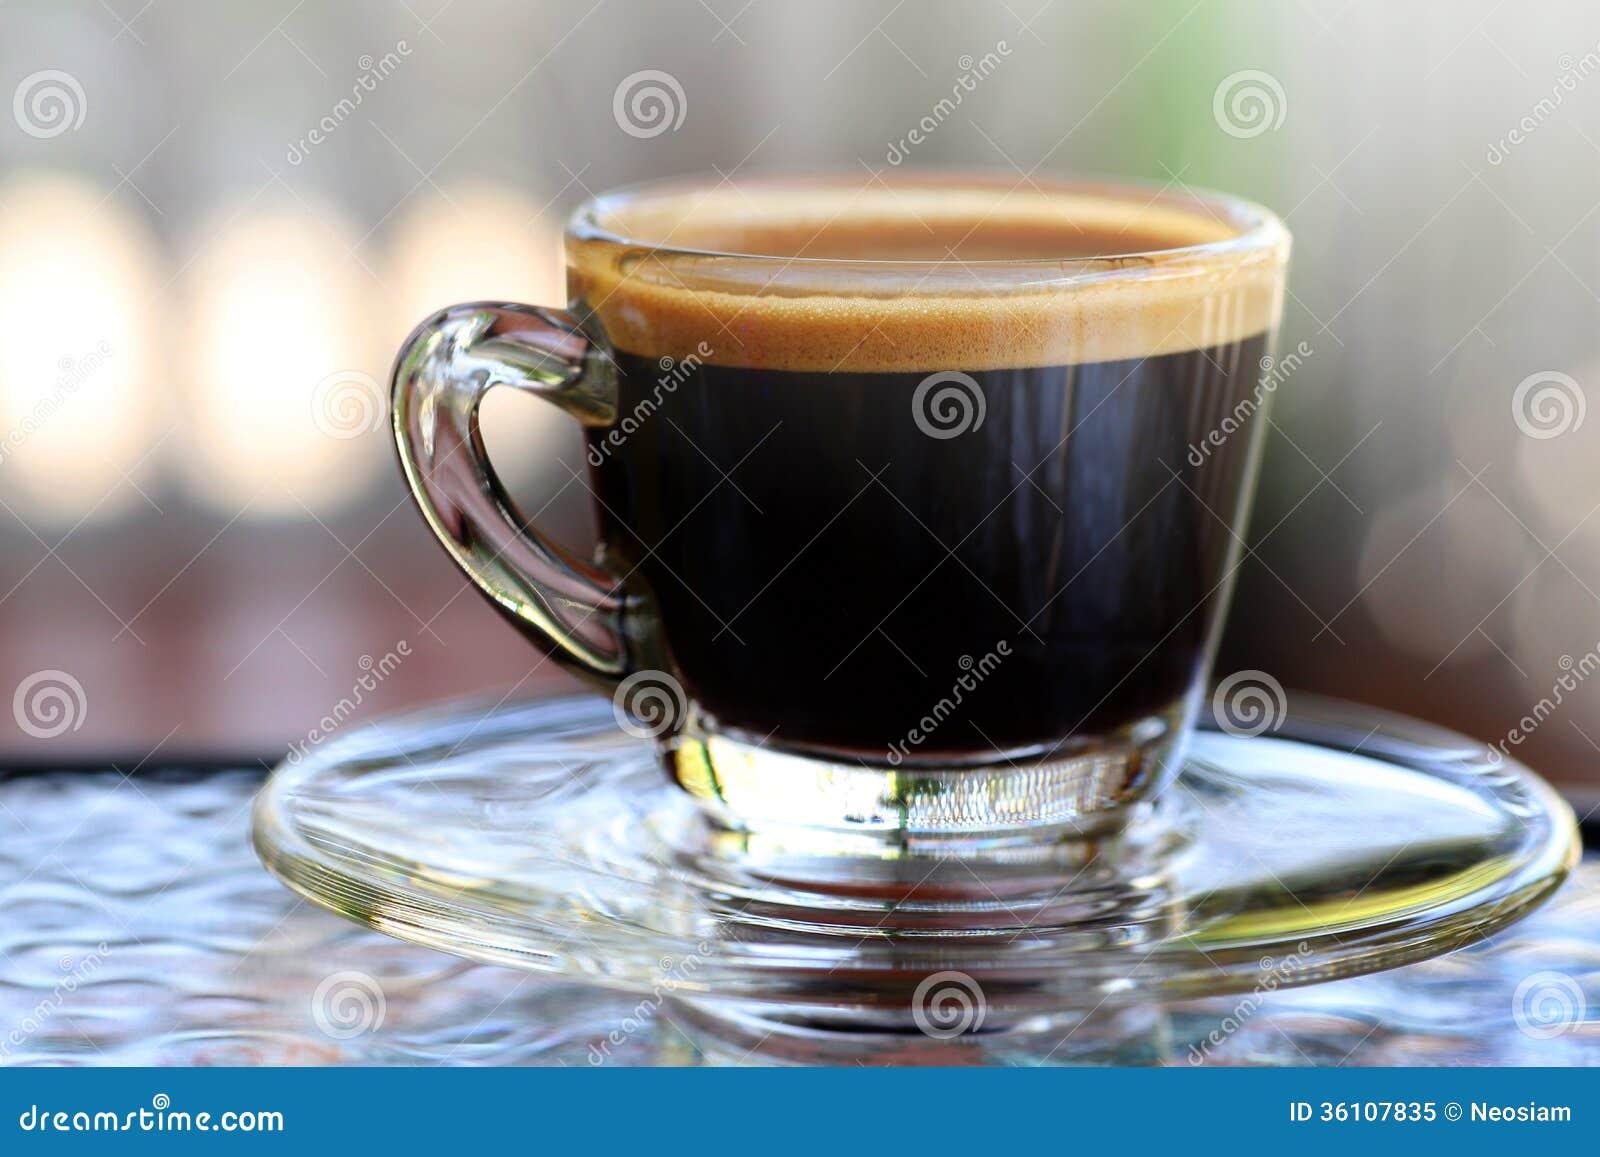 Espresso Coffee Glass ~ Espresso coffee stock image of